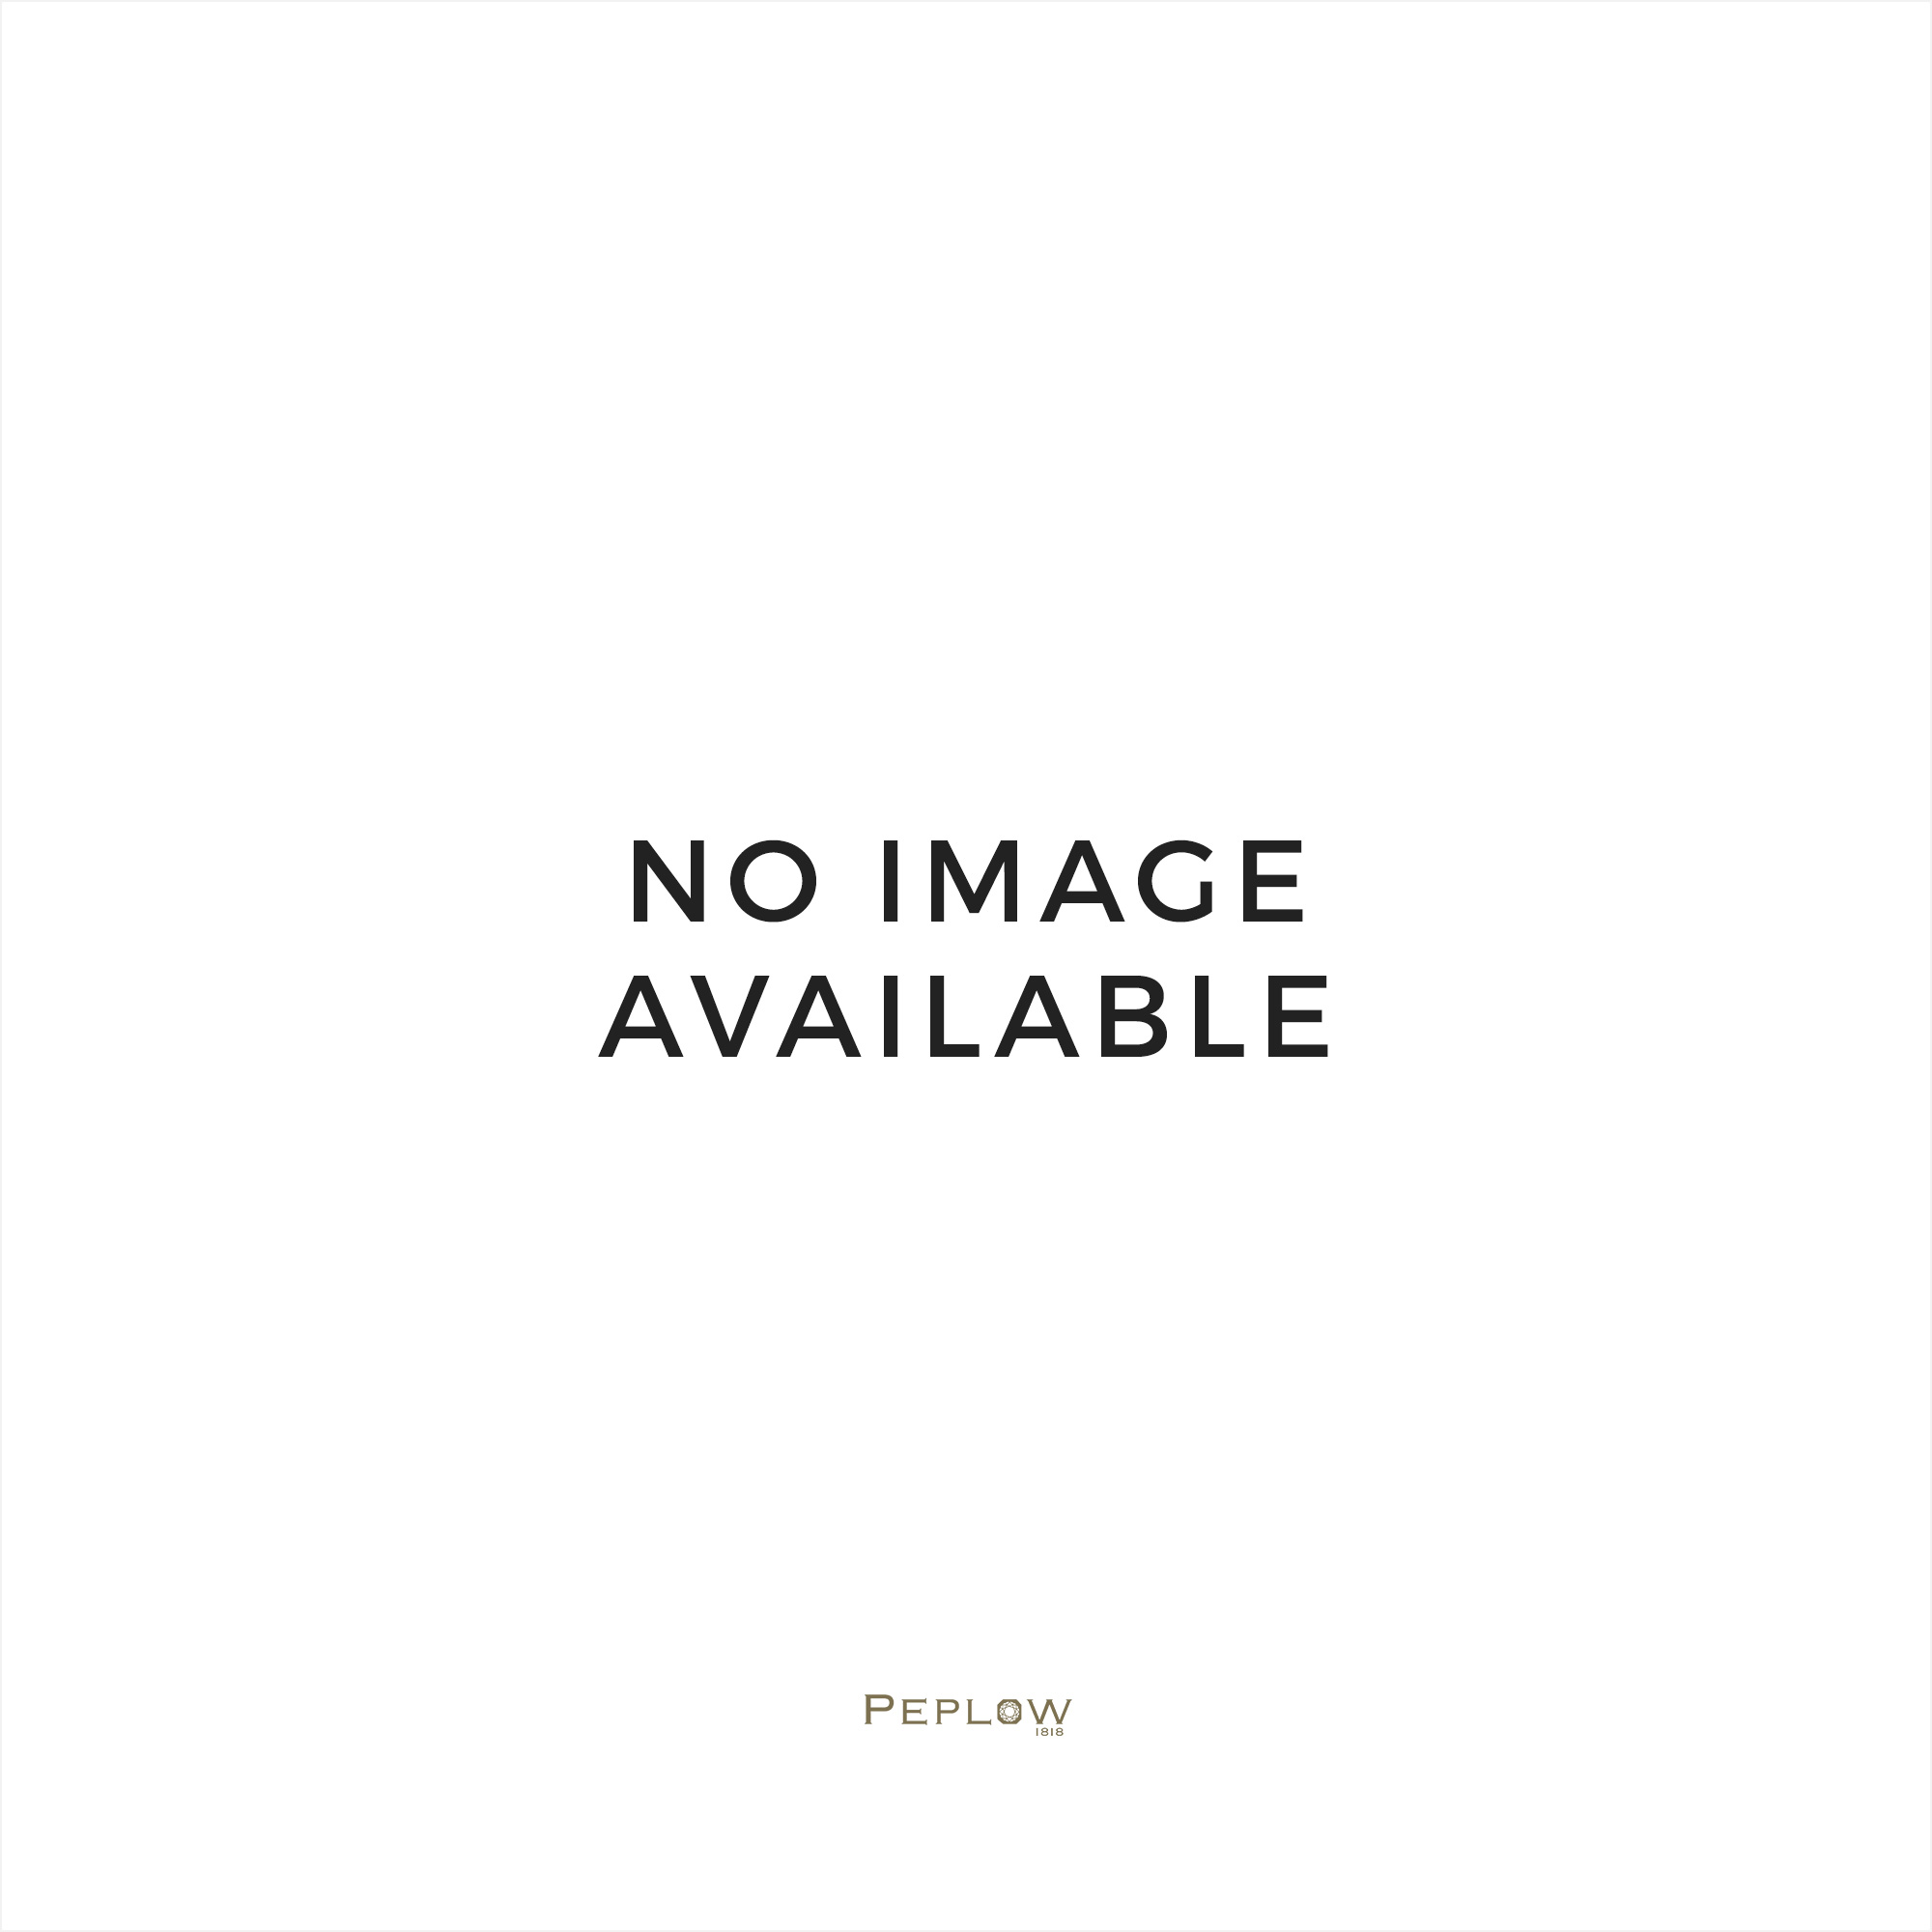 Ladies 18 carat gold Rolex Datejust with diamond set bezel.